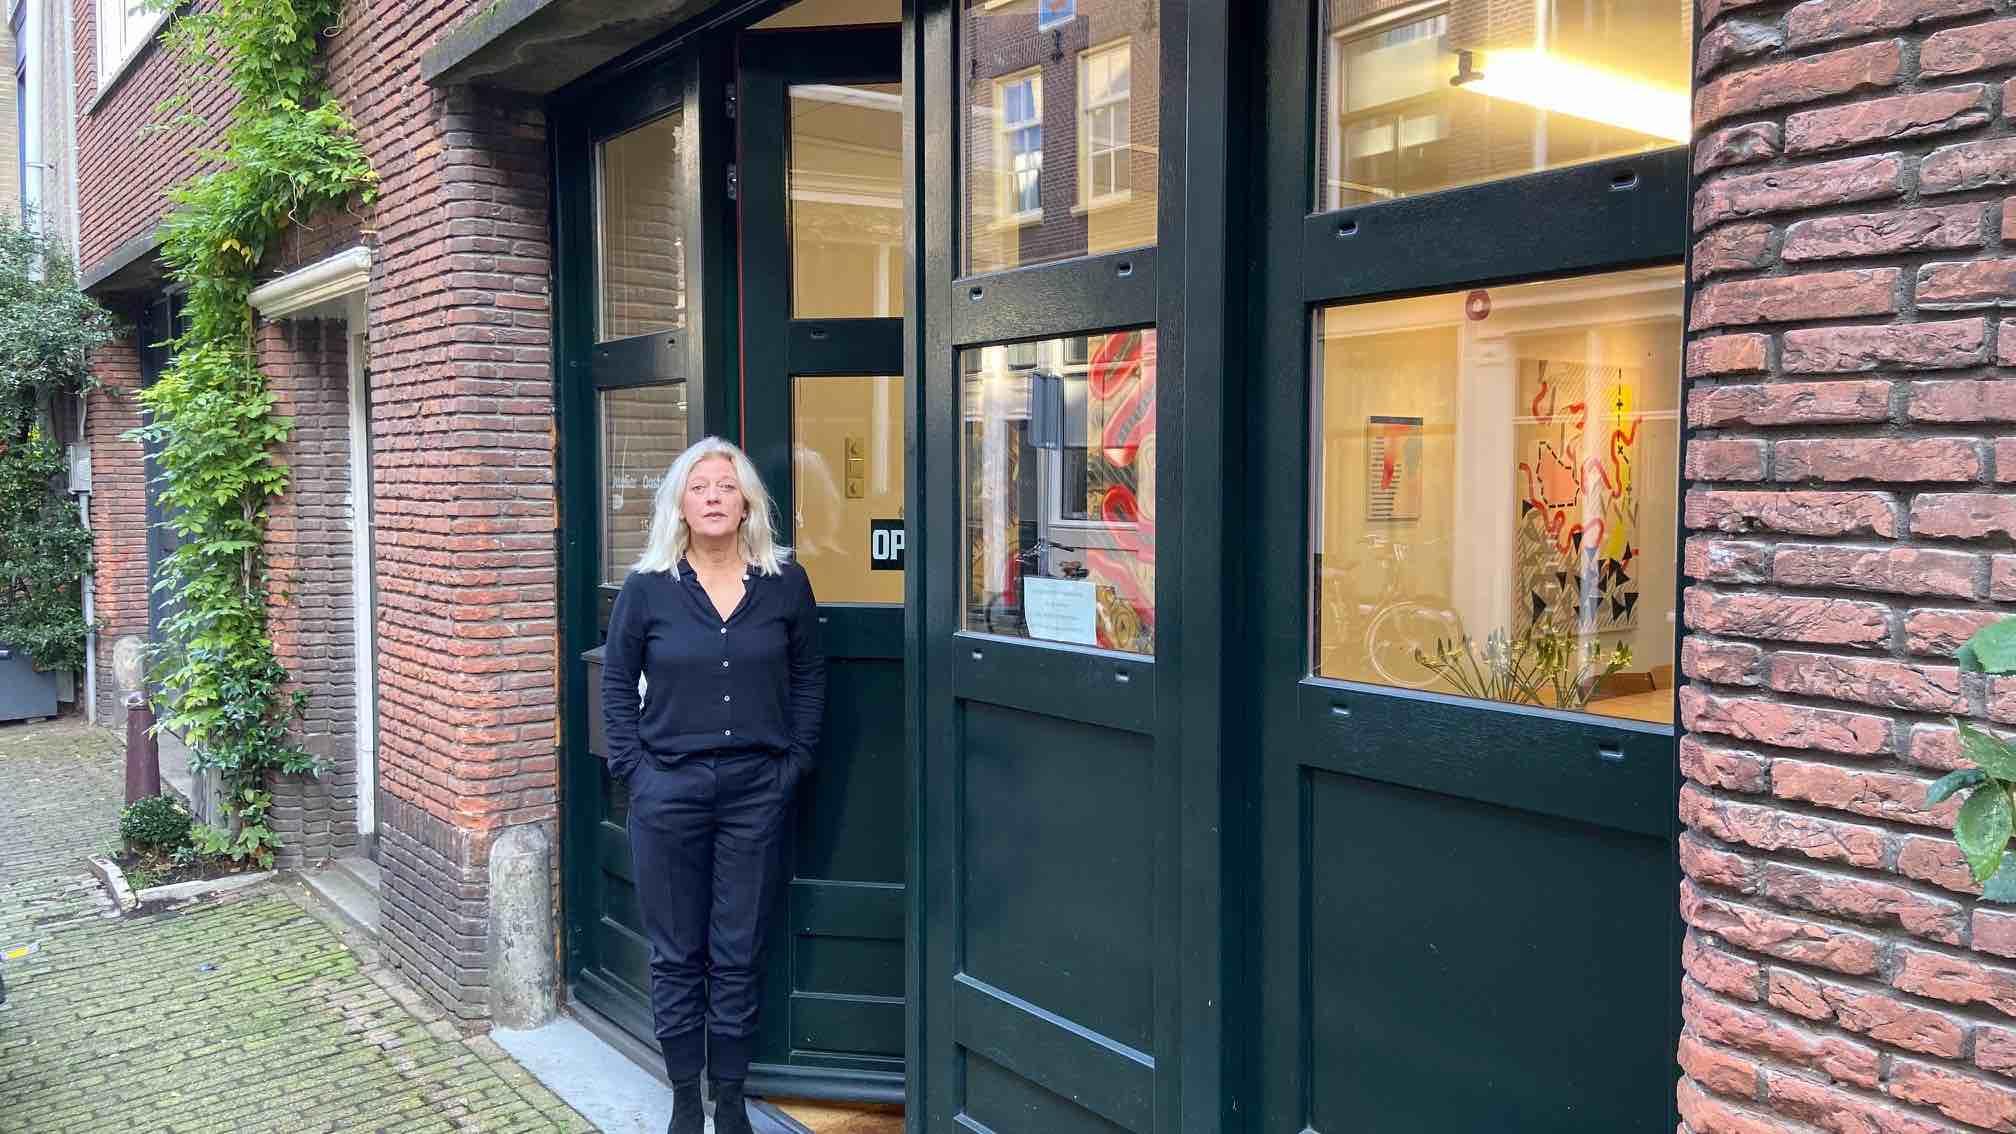 Anita_Oosterbosch